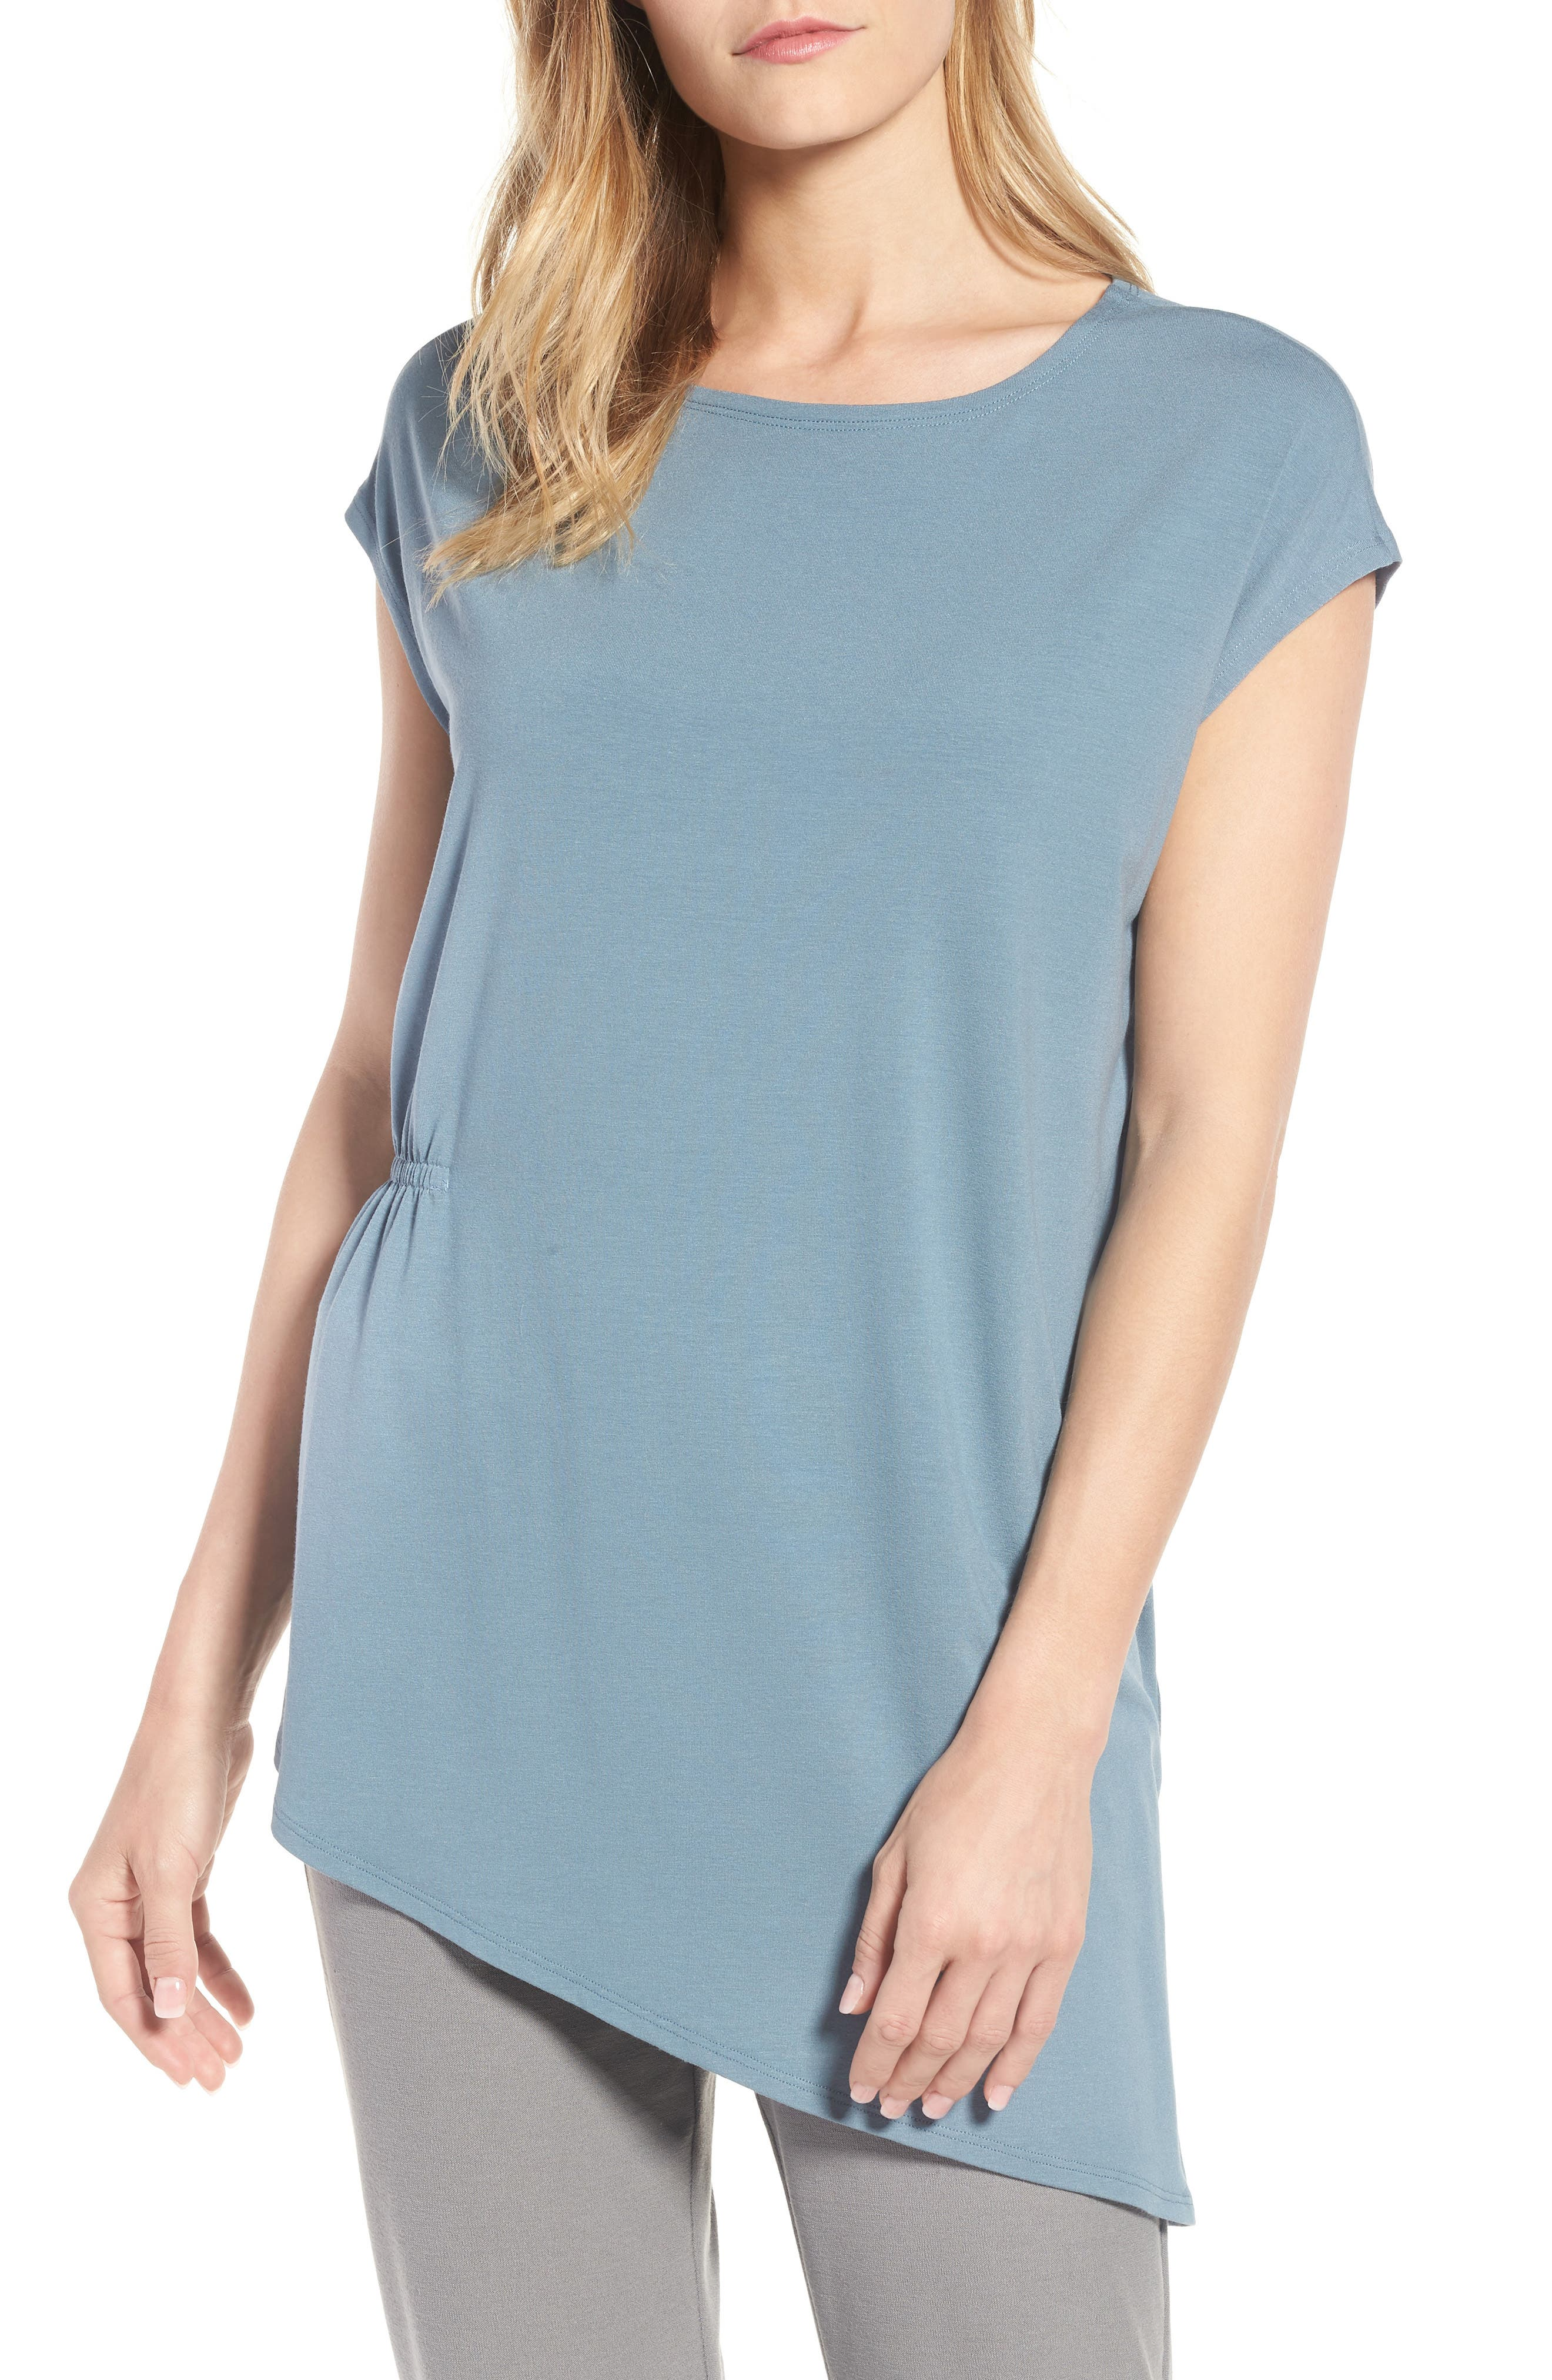 Main Image - Eileen Fisher Asymmetrical Stretch Jersey Top (Regular & Petite)